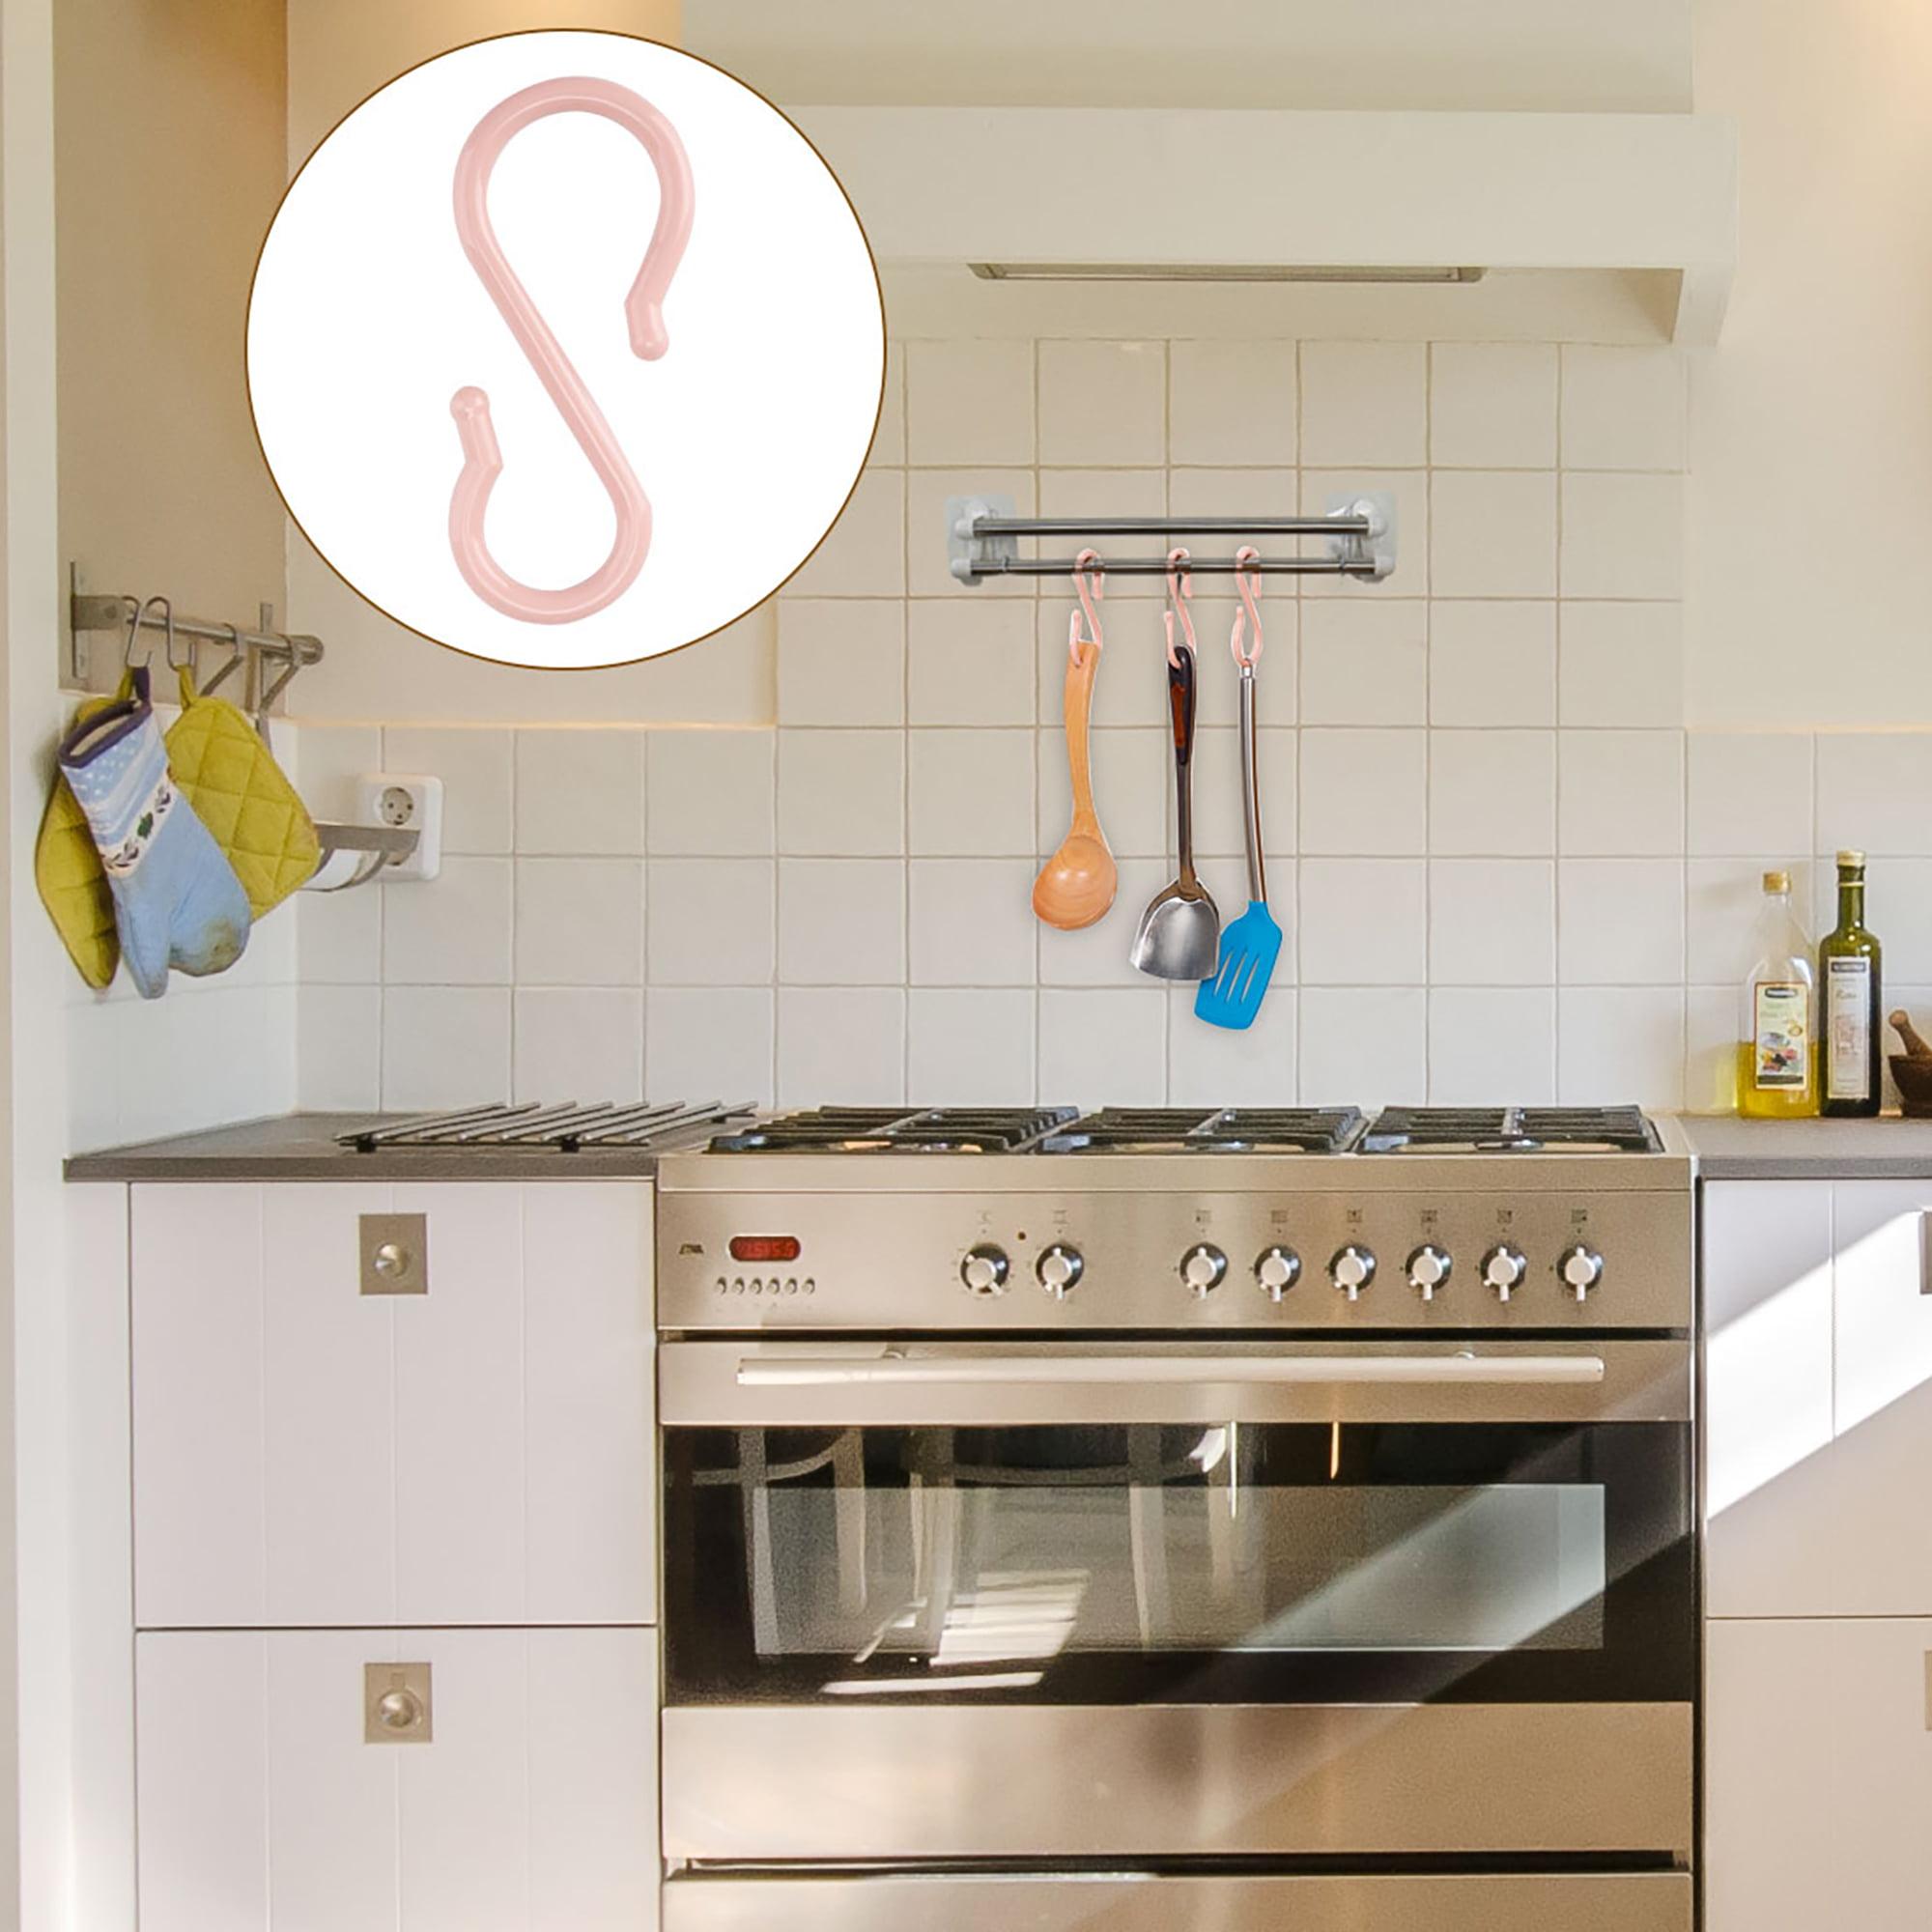 100X Plastic S Shaped Hanging Hooks Hanger for Kitchen Bathroom Bedroom